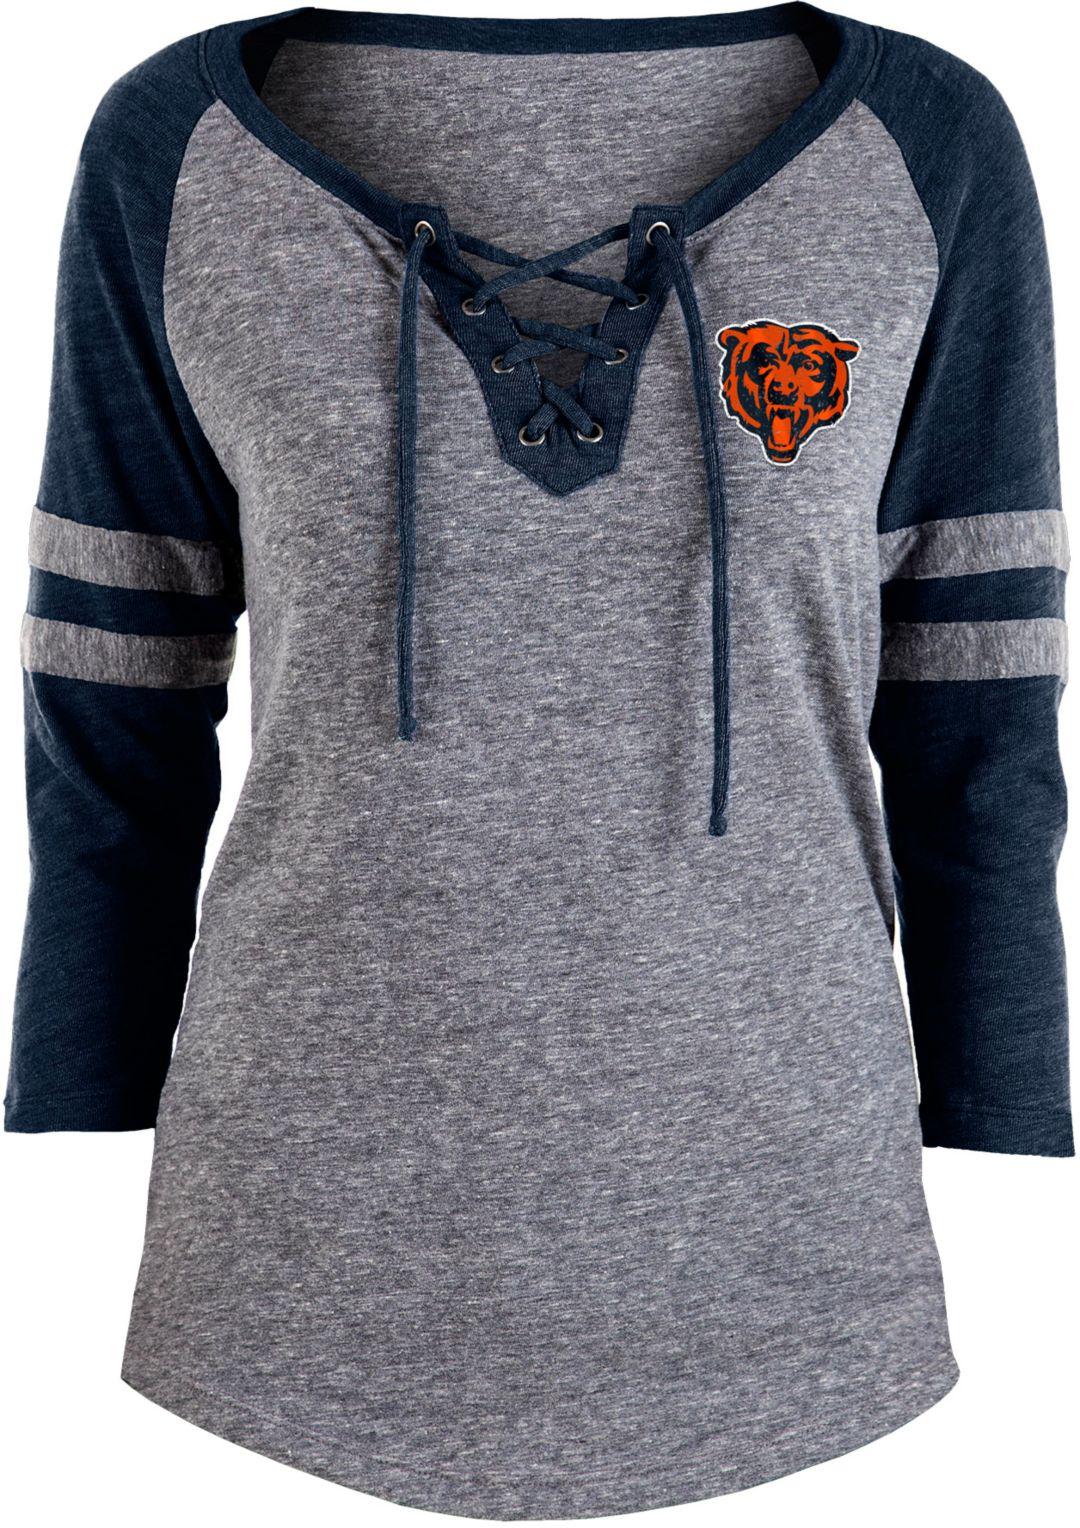 NFL Team Apparel Women's Chicago Bears Trilace Grey Raglan Shirt